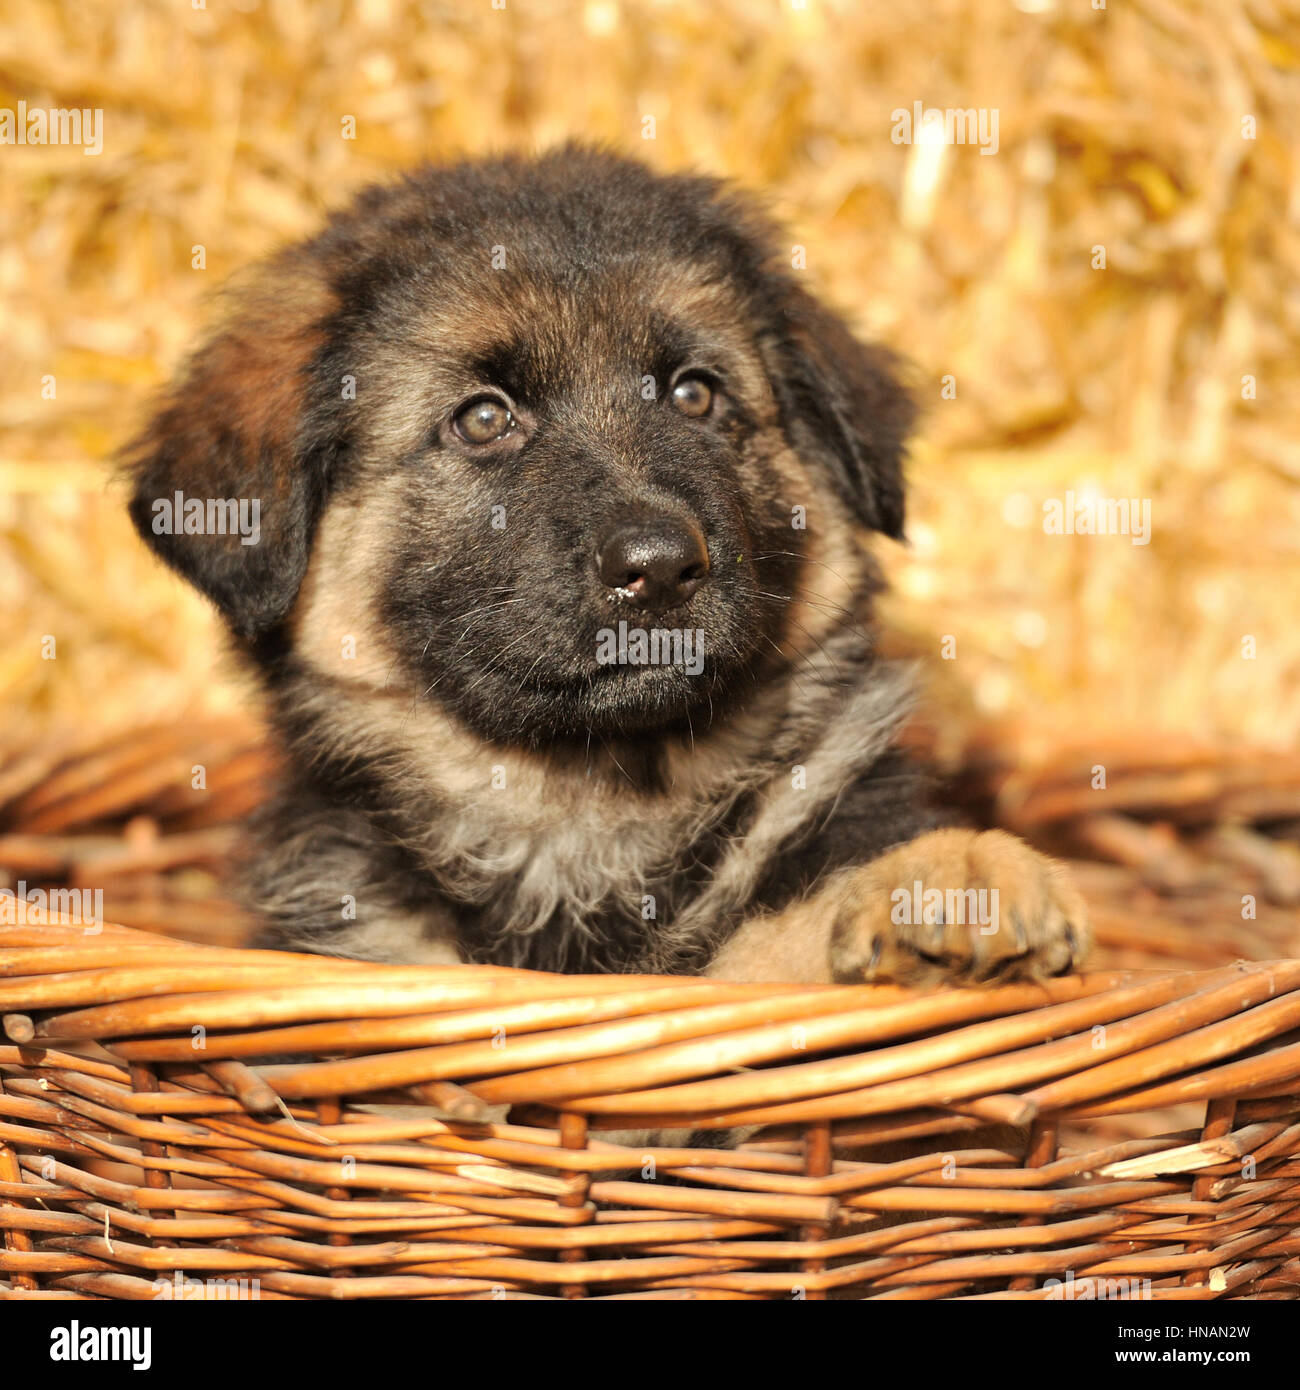 german shepherd dog puppy - Stock Image